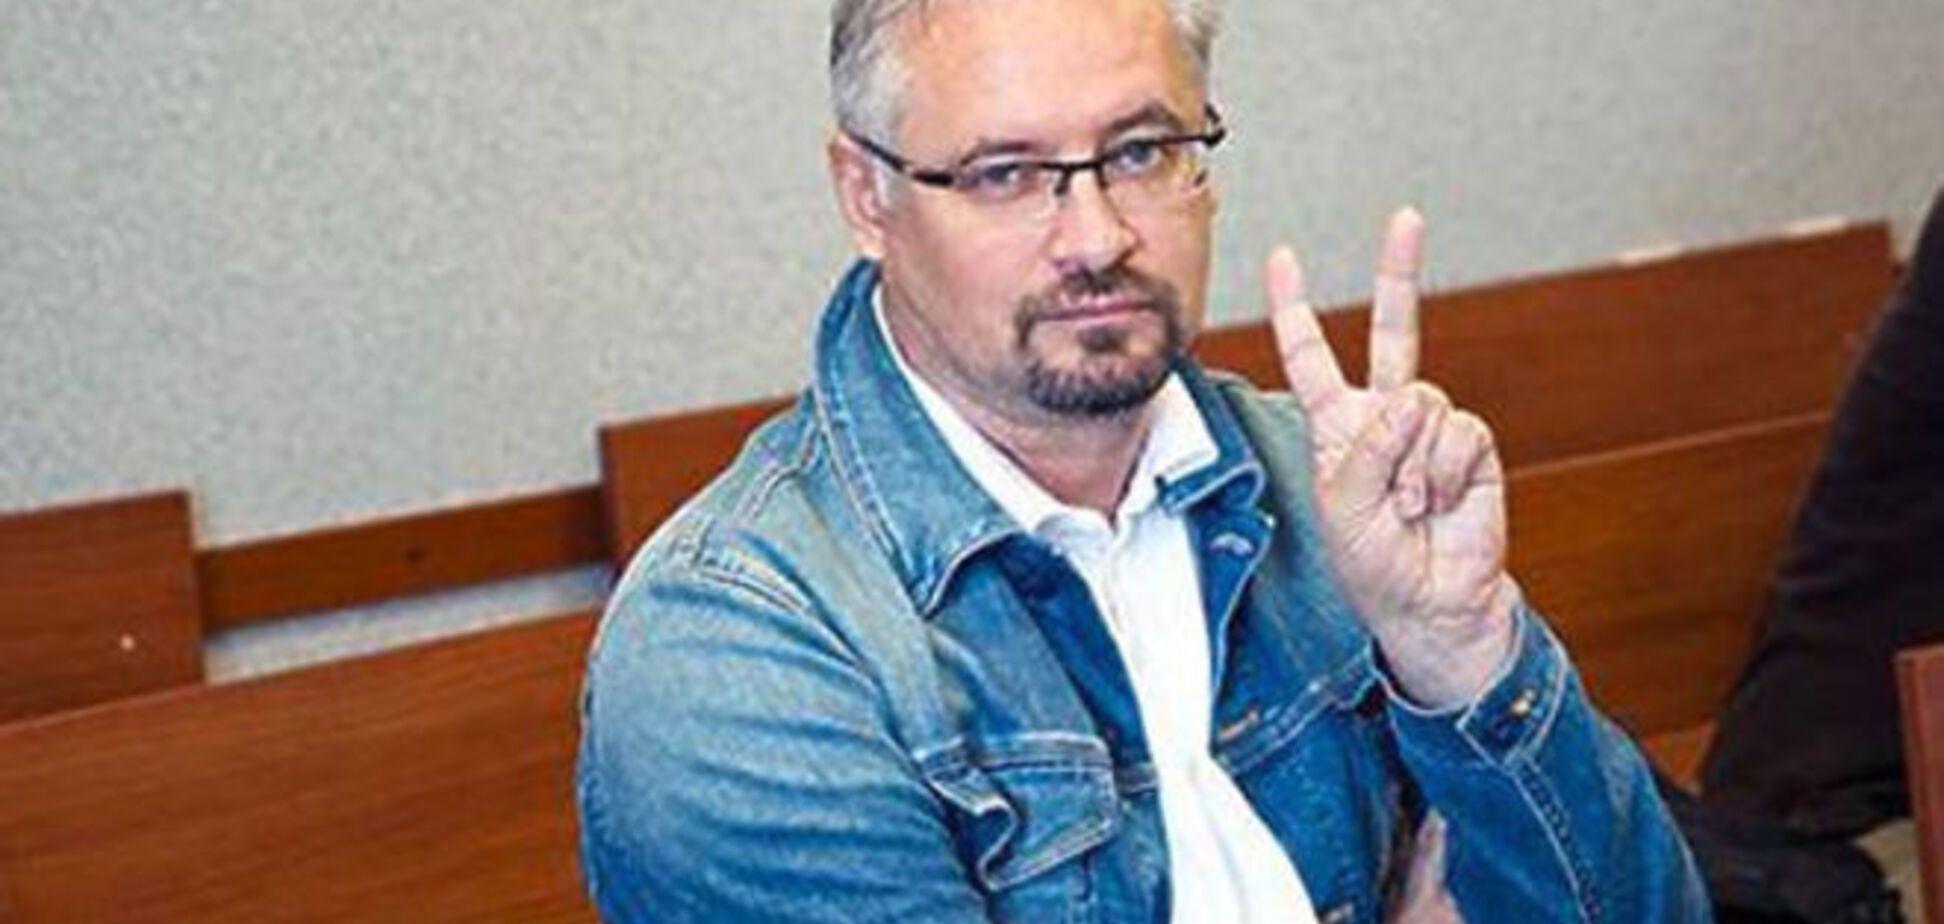 В России хотят утереть нос 'Плейбою' журналом 'Др*чун'